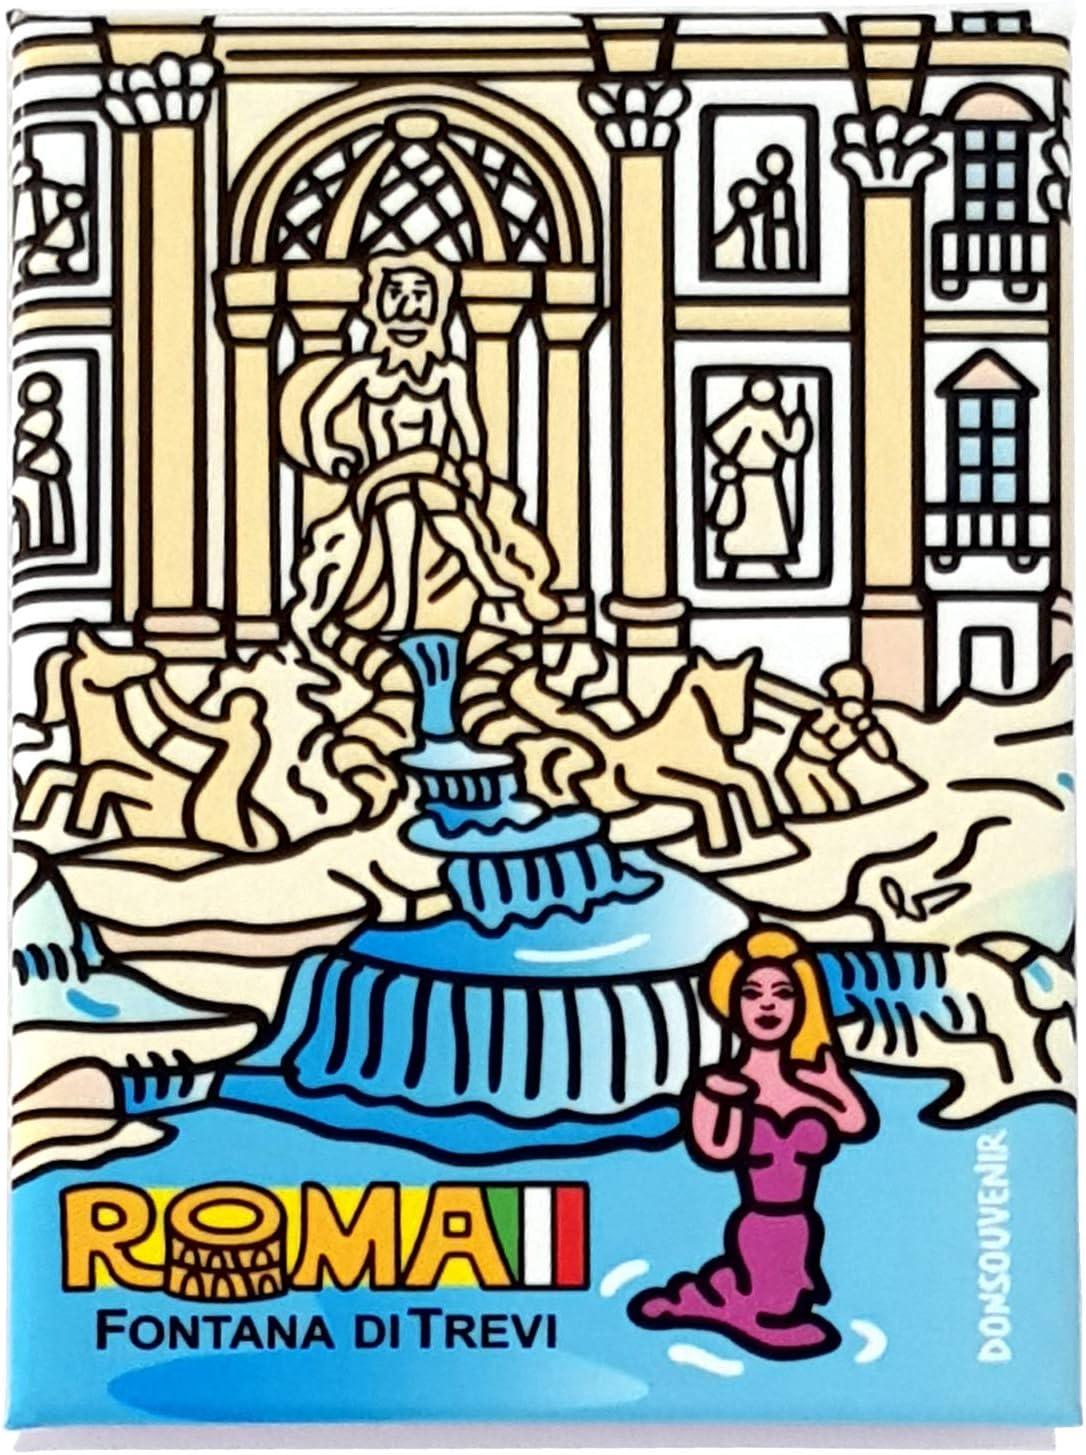 DONSOUVENIR MAGNETICO Fontana DI Trevi IMAN Roma Originale.